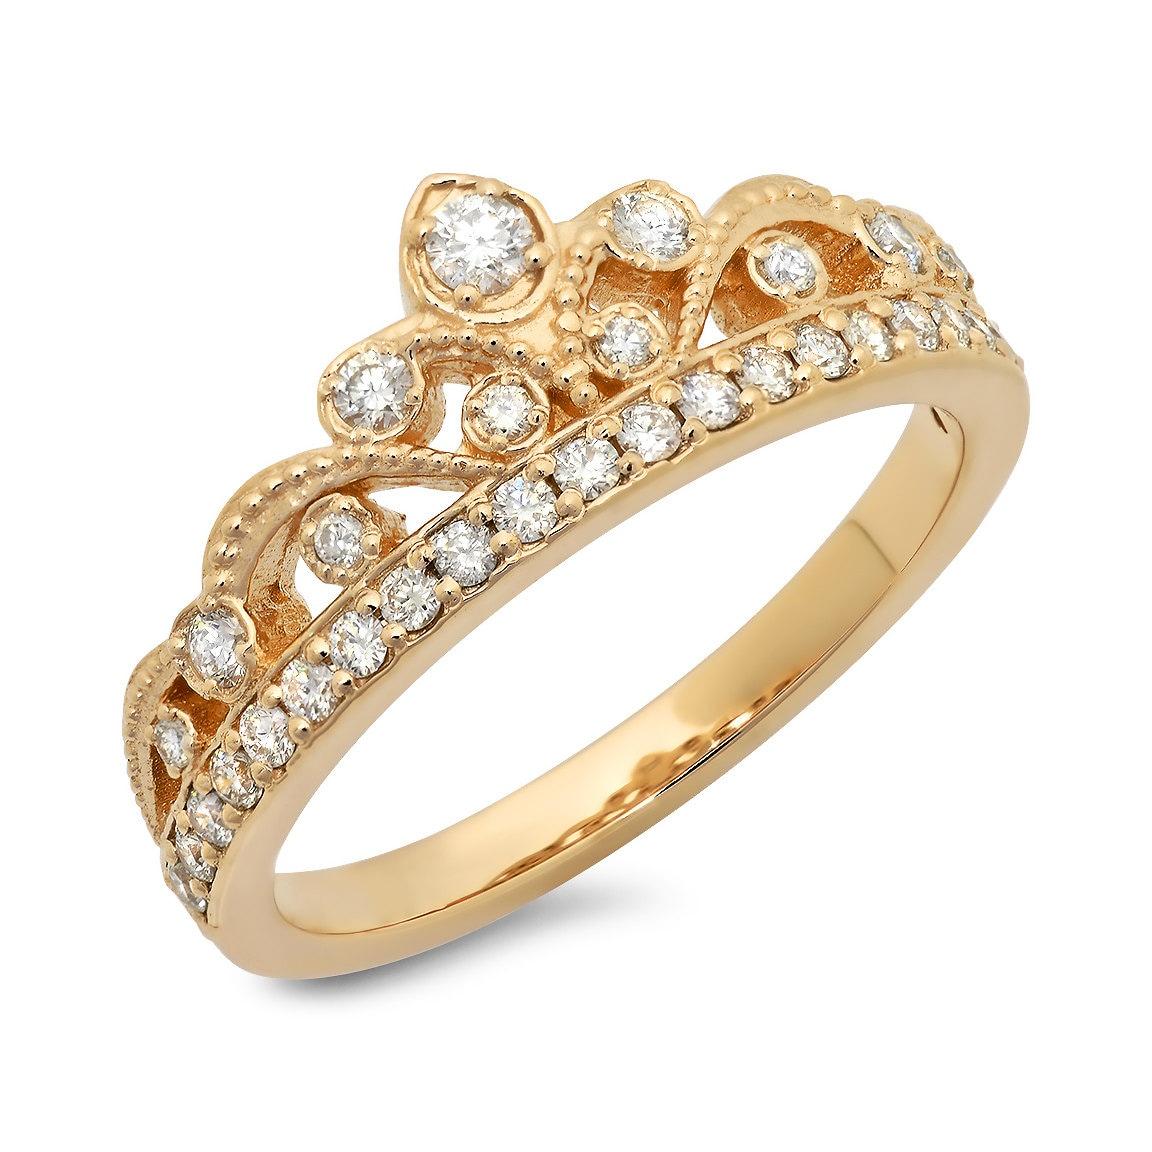 princess crown ring 40 ct tw by jewelersenterprise